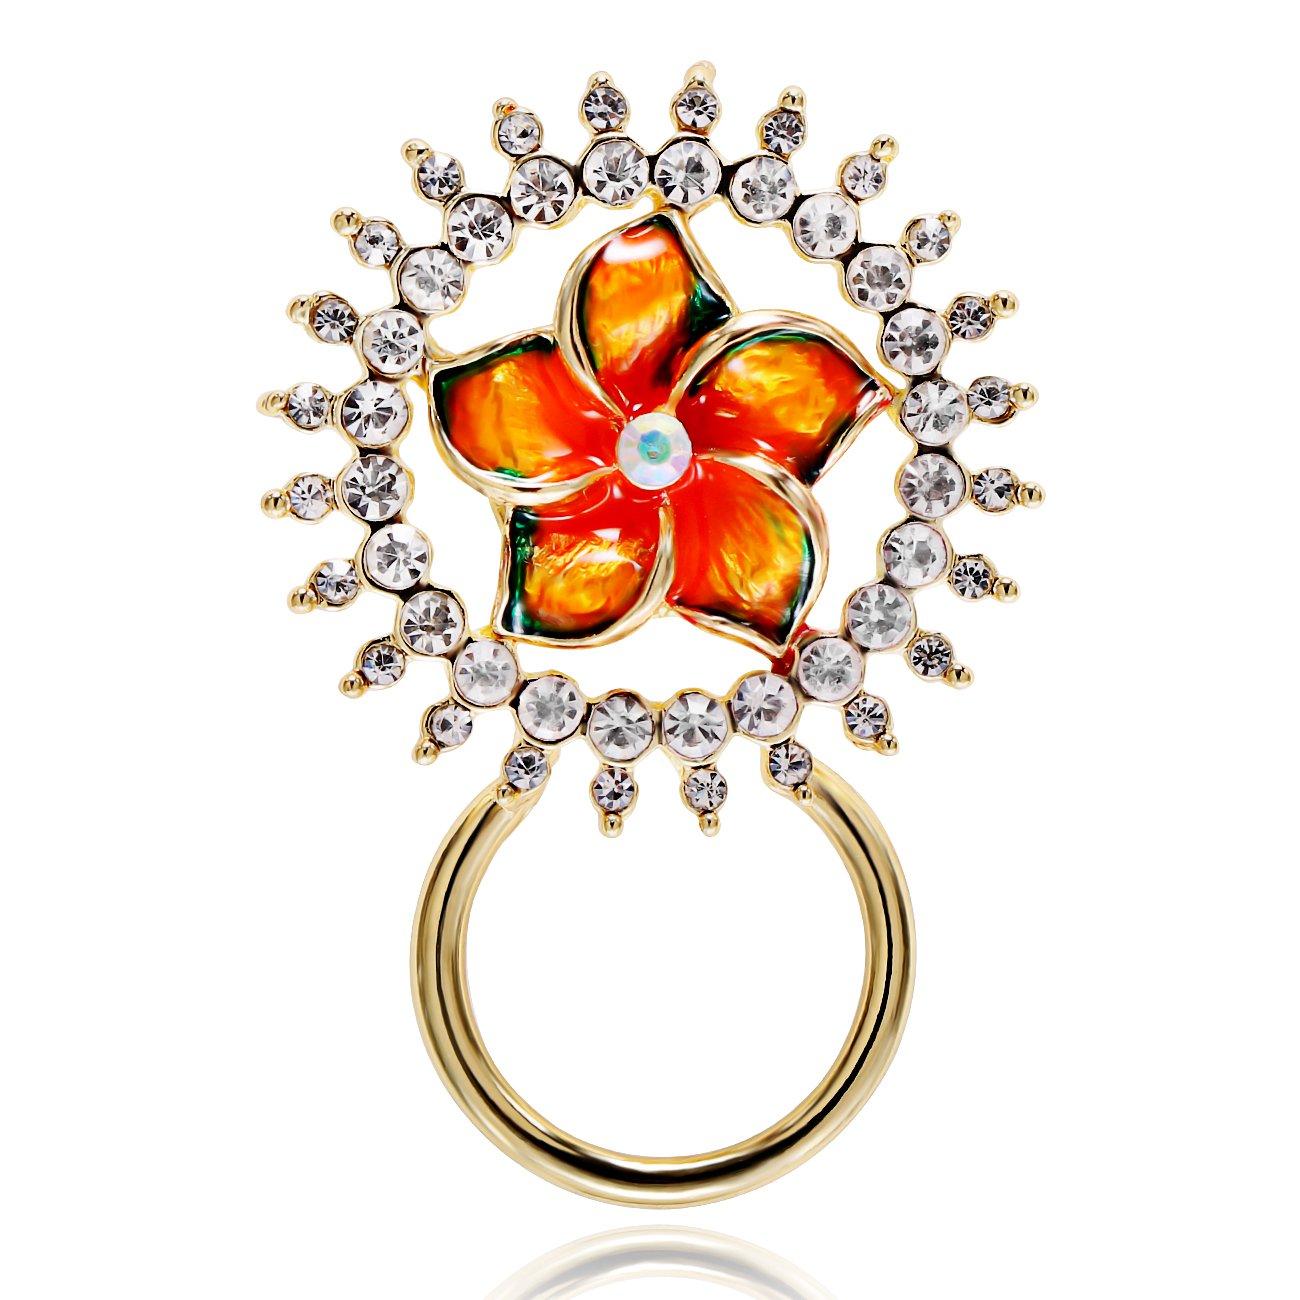 NOUMANDA Pretty Yellow Flower Shining Crystal Circle Eyeglass Sunglass Holder Romantic Brooch Pin Jewelry (gold)